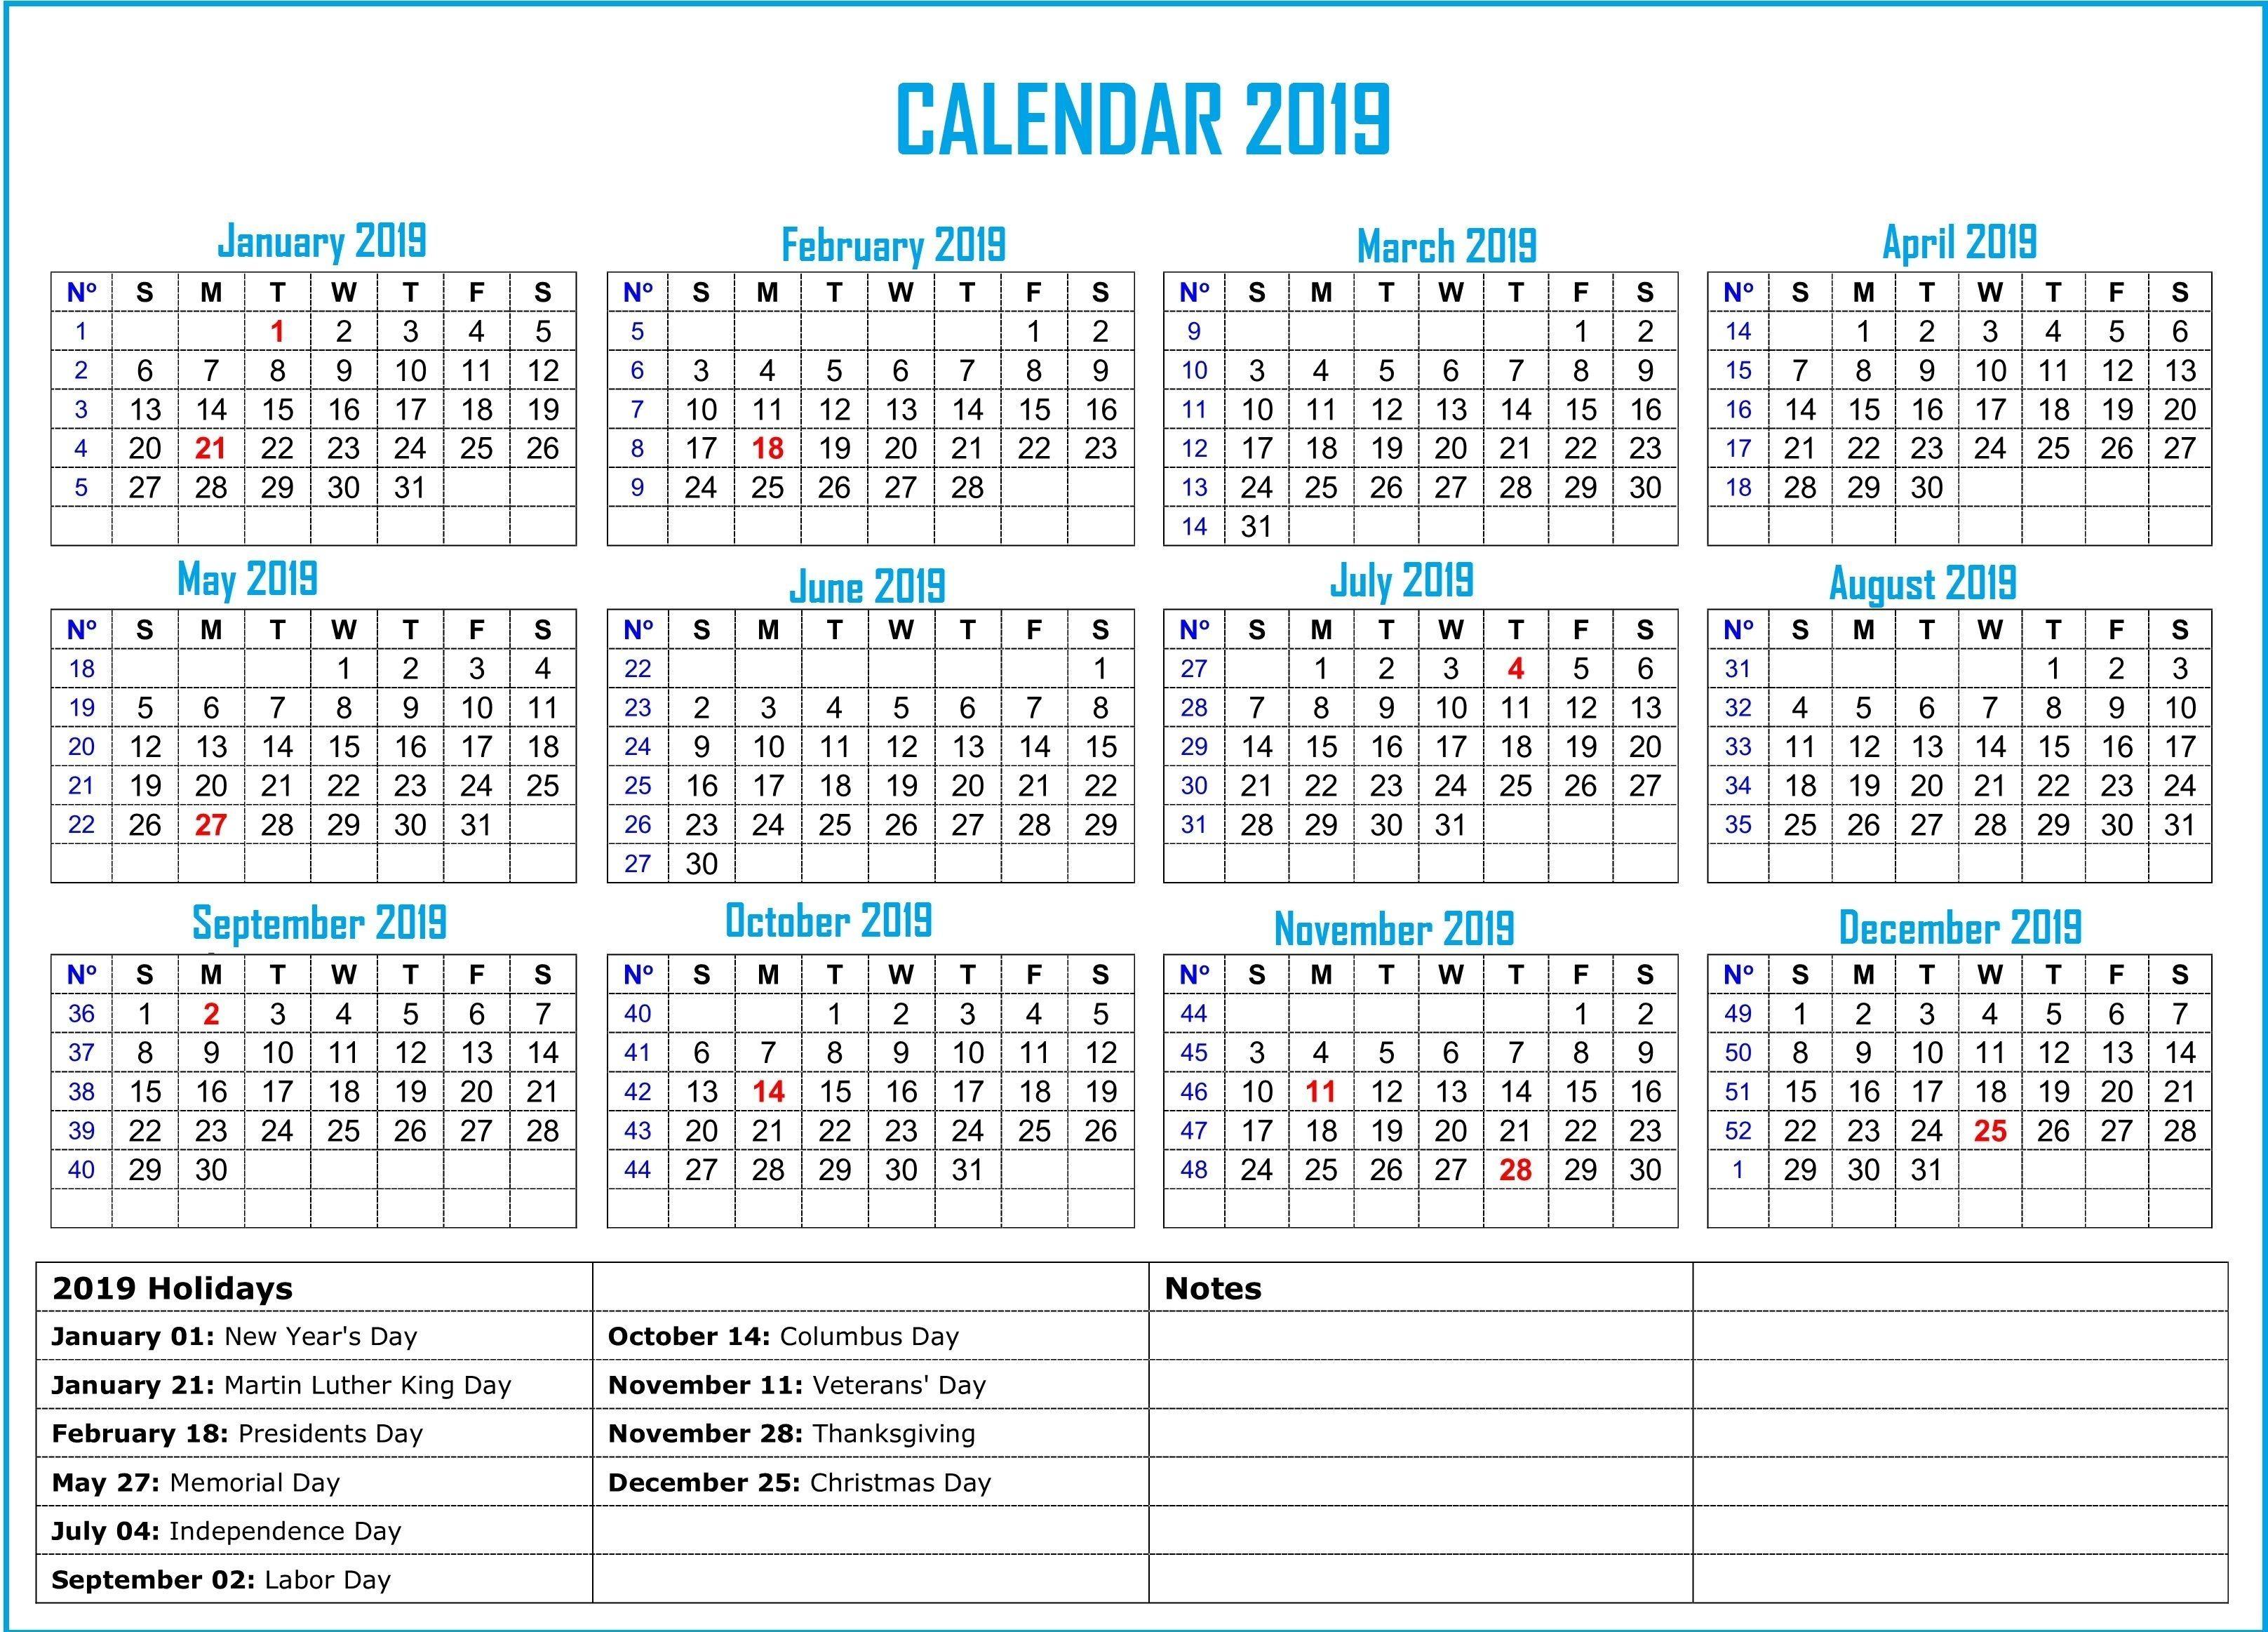 Get 7 Day Calendar August 2019 American Holiday Calendar Us